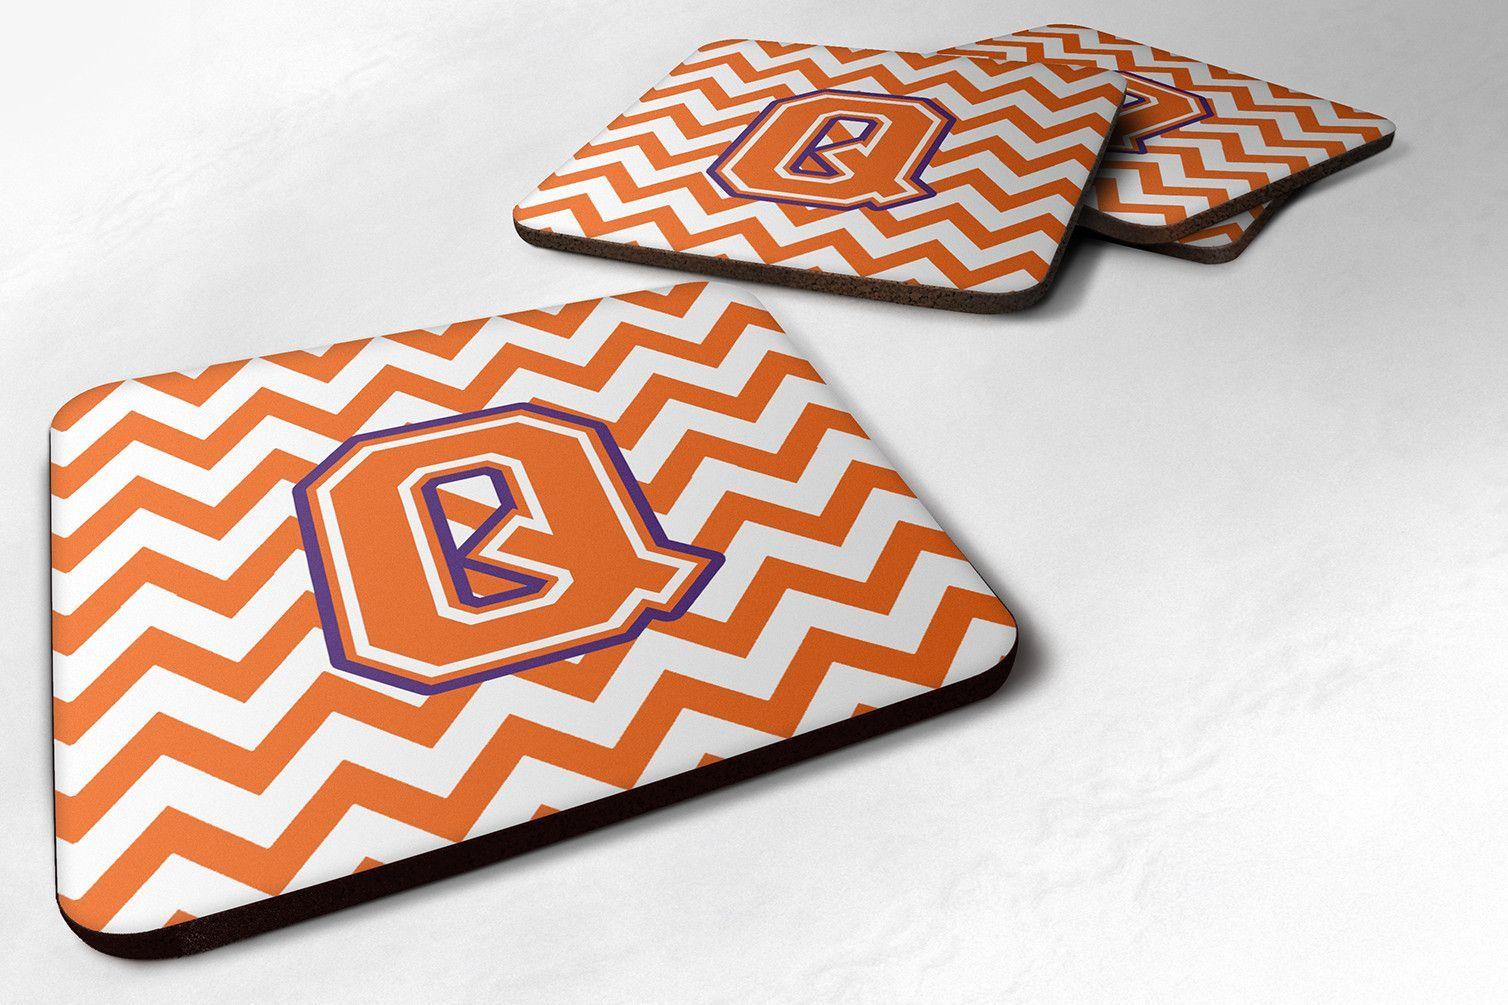 Letter Q Chevron Orange and Regalia Foam Coaster Set of 4 CJ1062-QFC